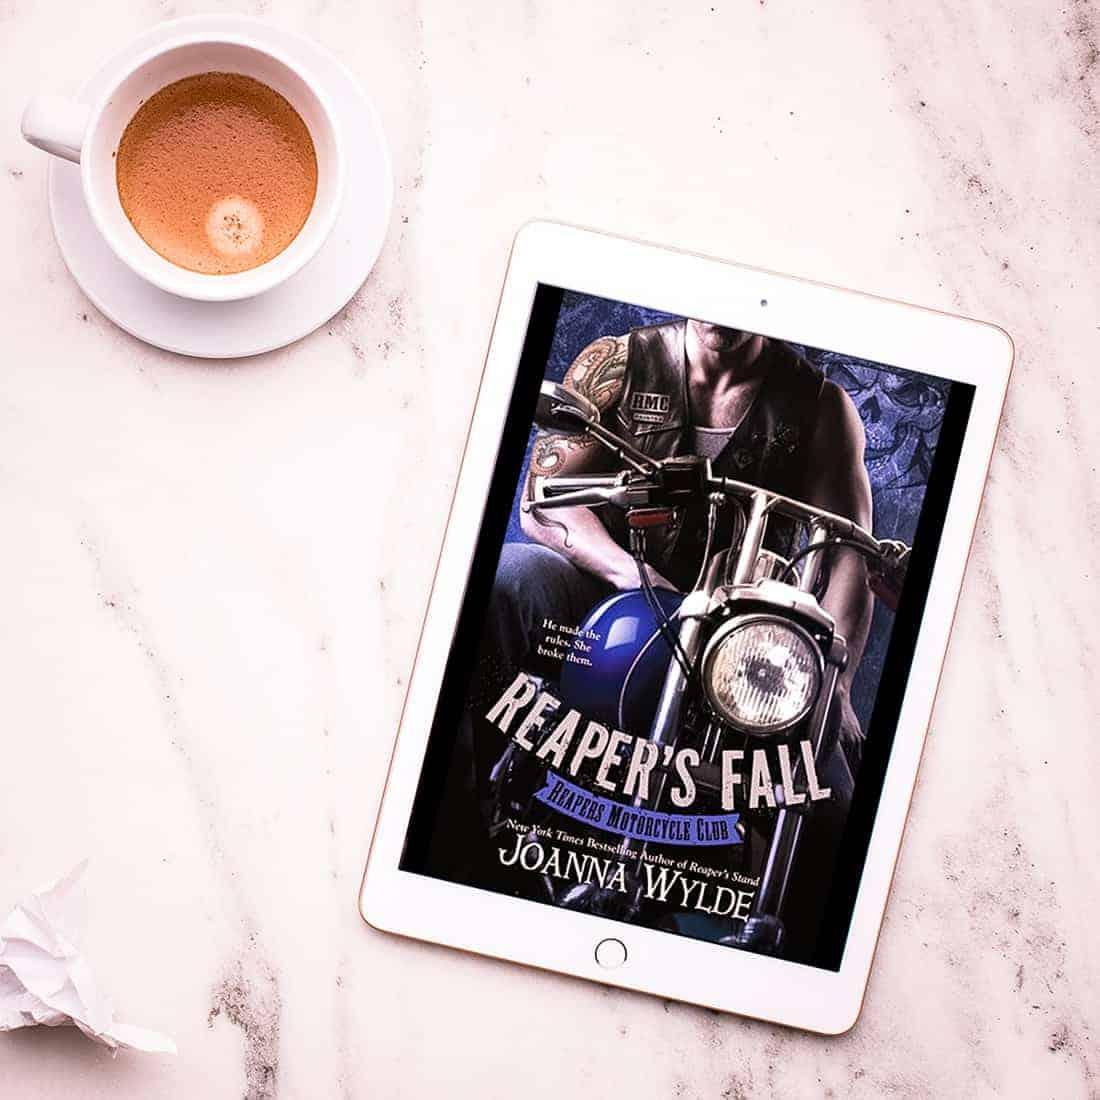 Reaper's Fall by Joanna Wylde-featured